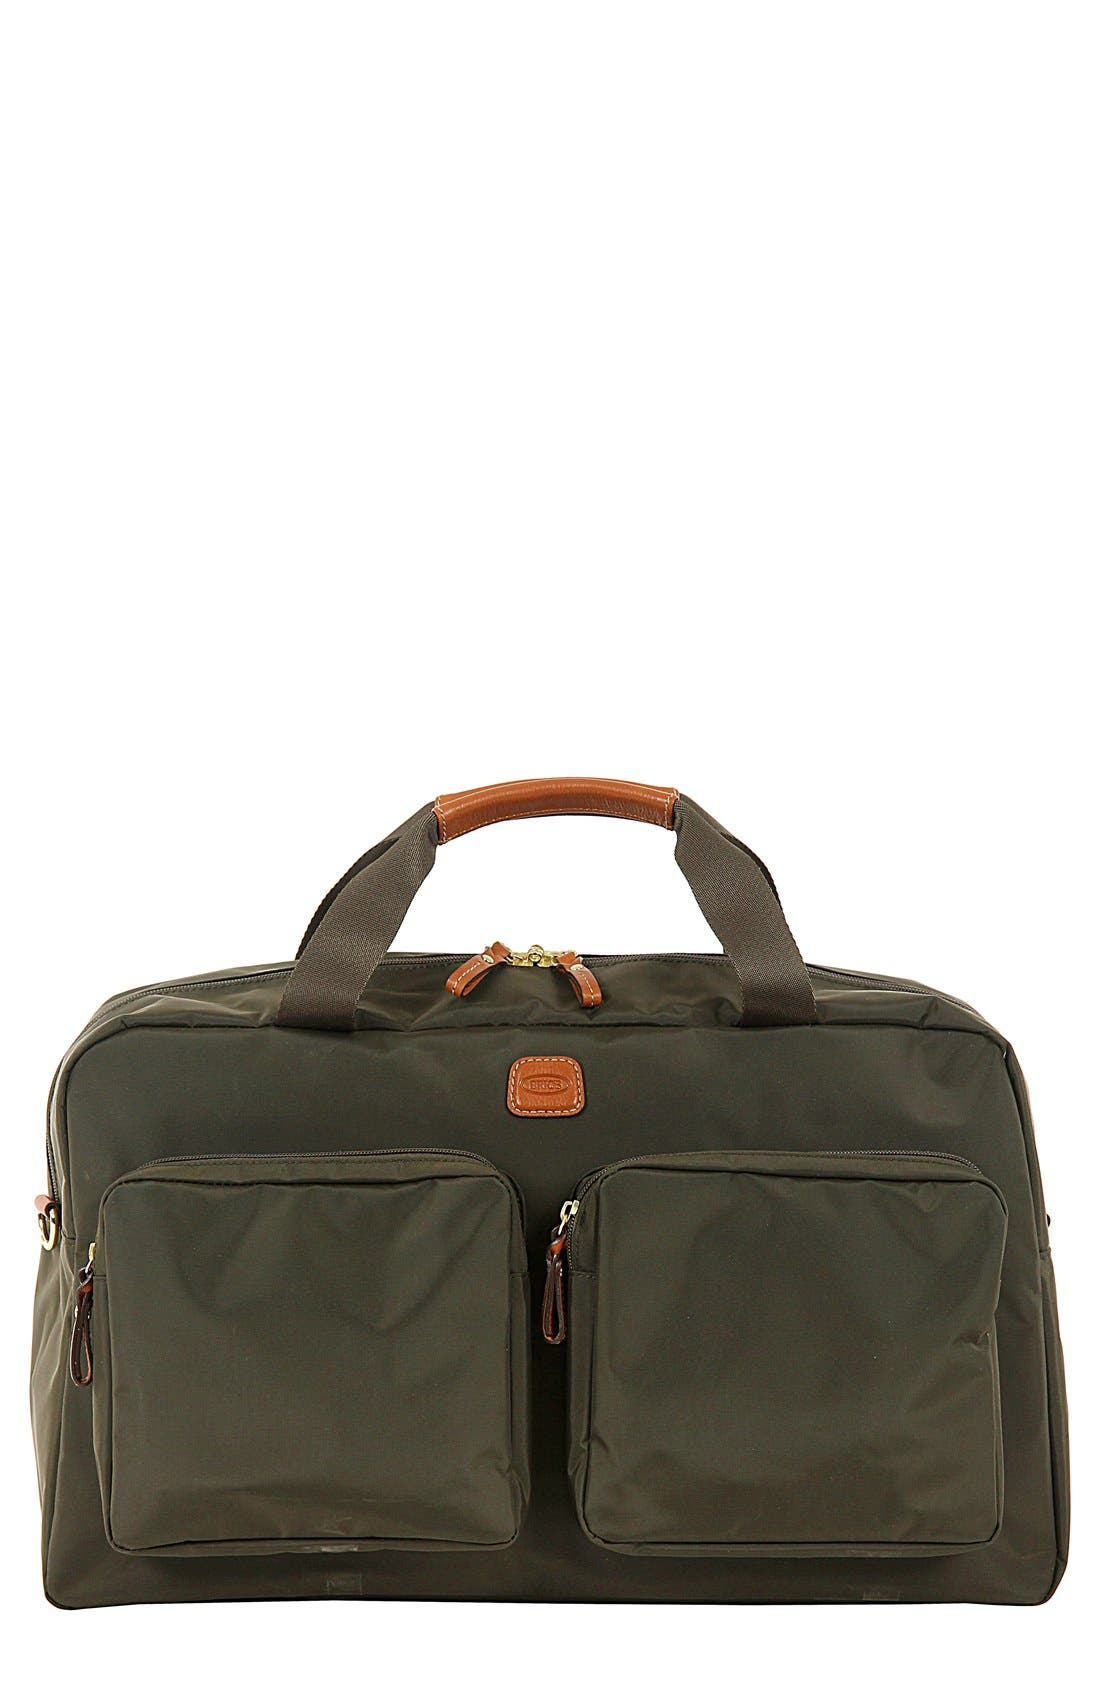 Bric's 'X-Bag Boarding' Duffel Bag